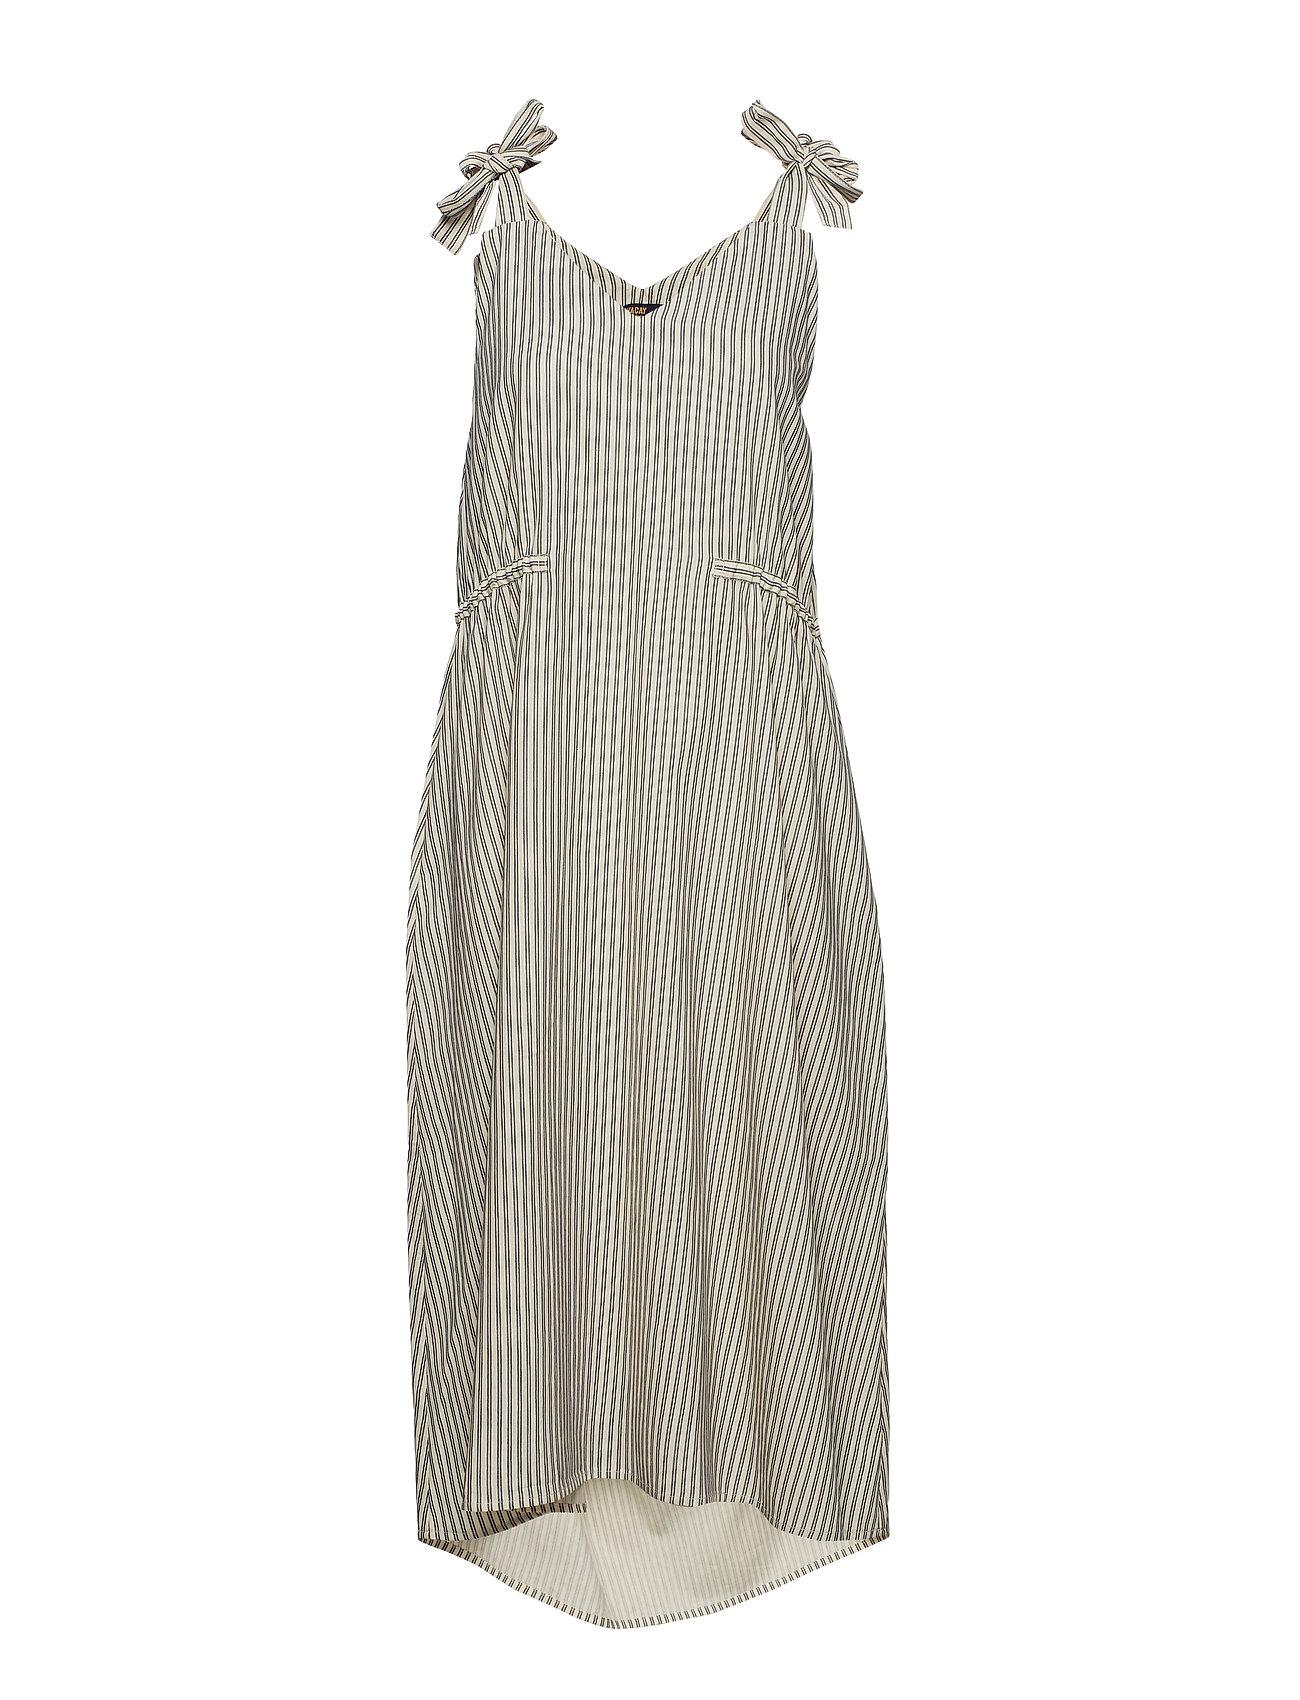 WACAY Mattea Dress - PINSTRIPE OFF WHITE